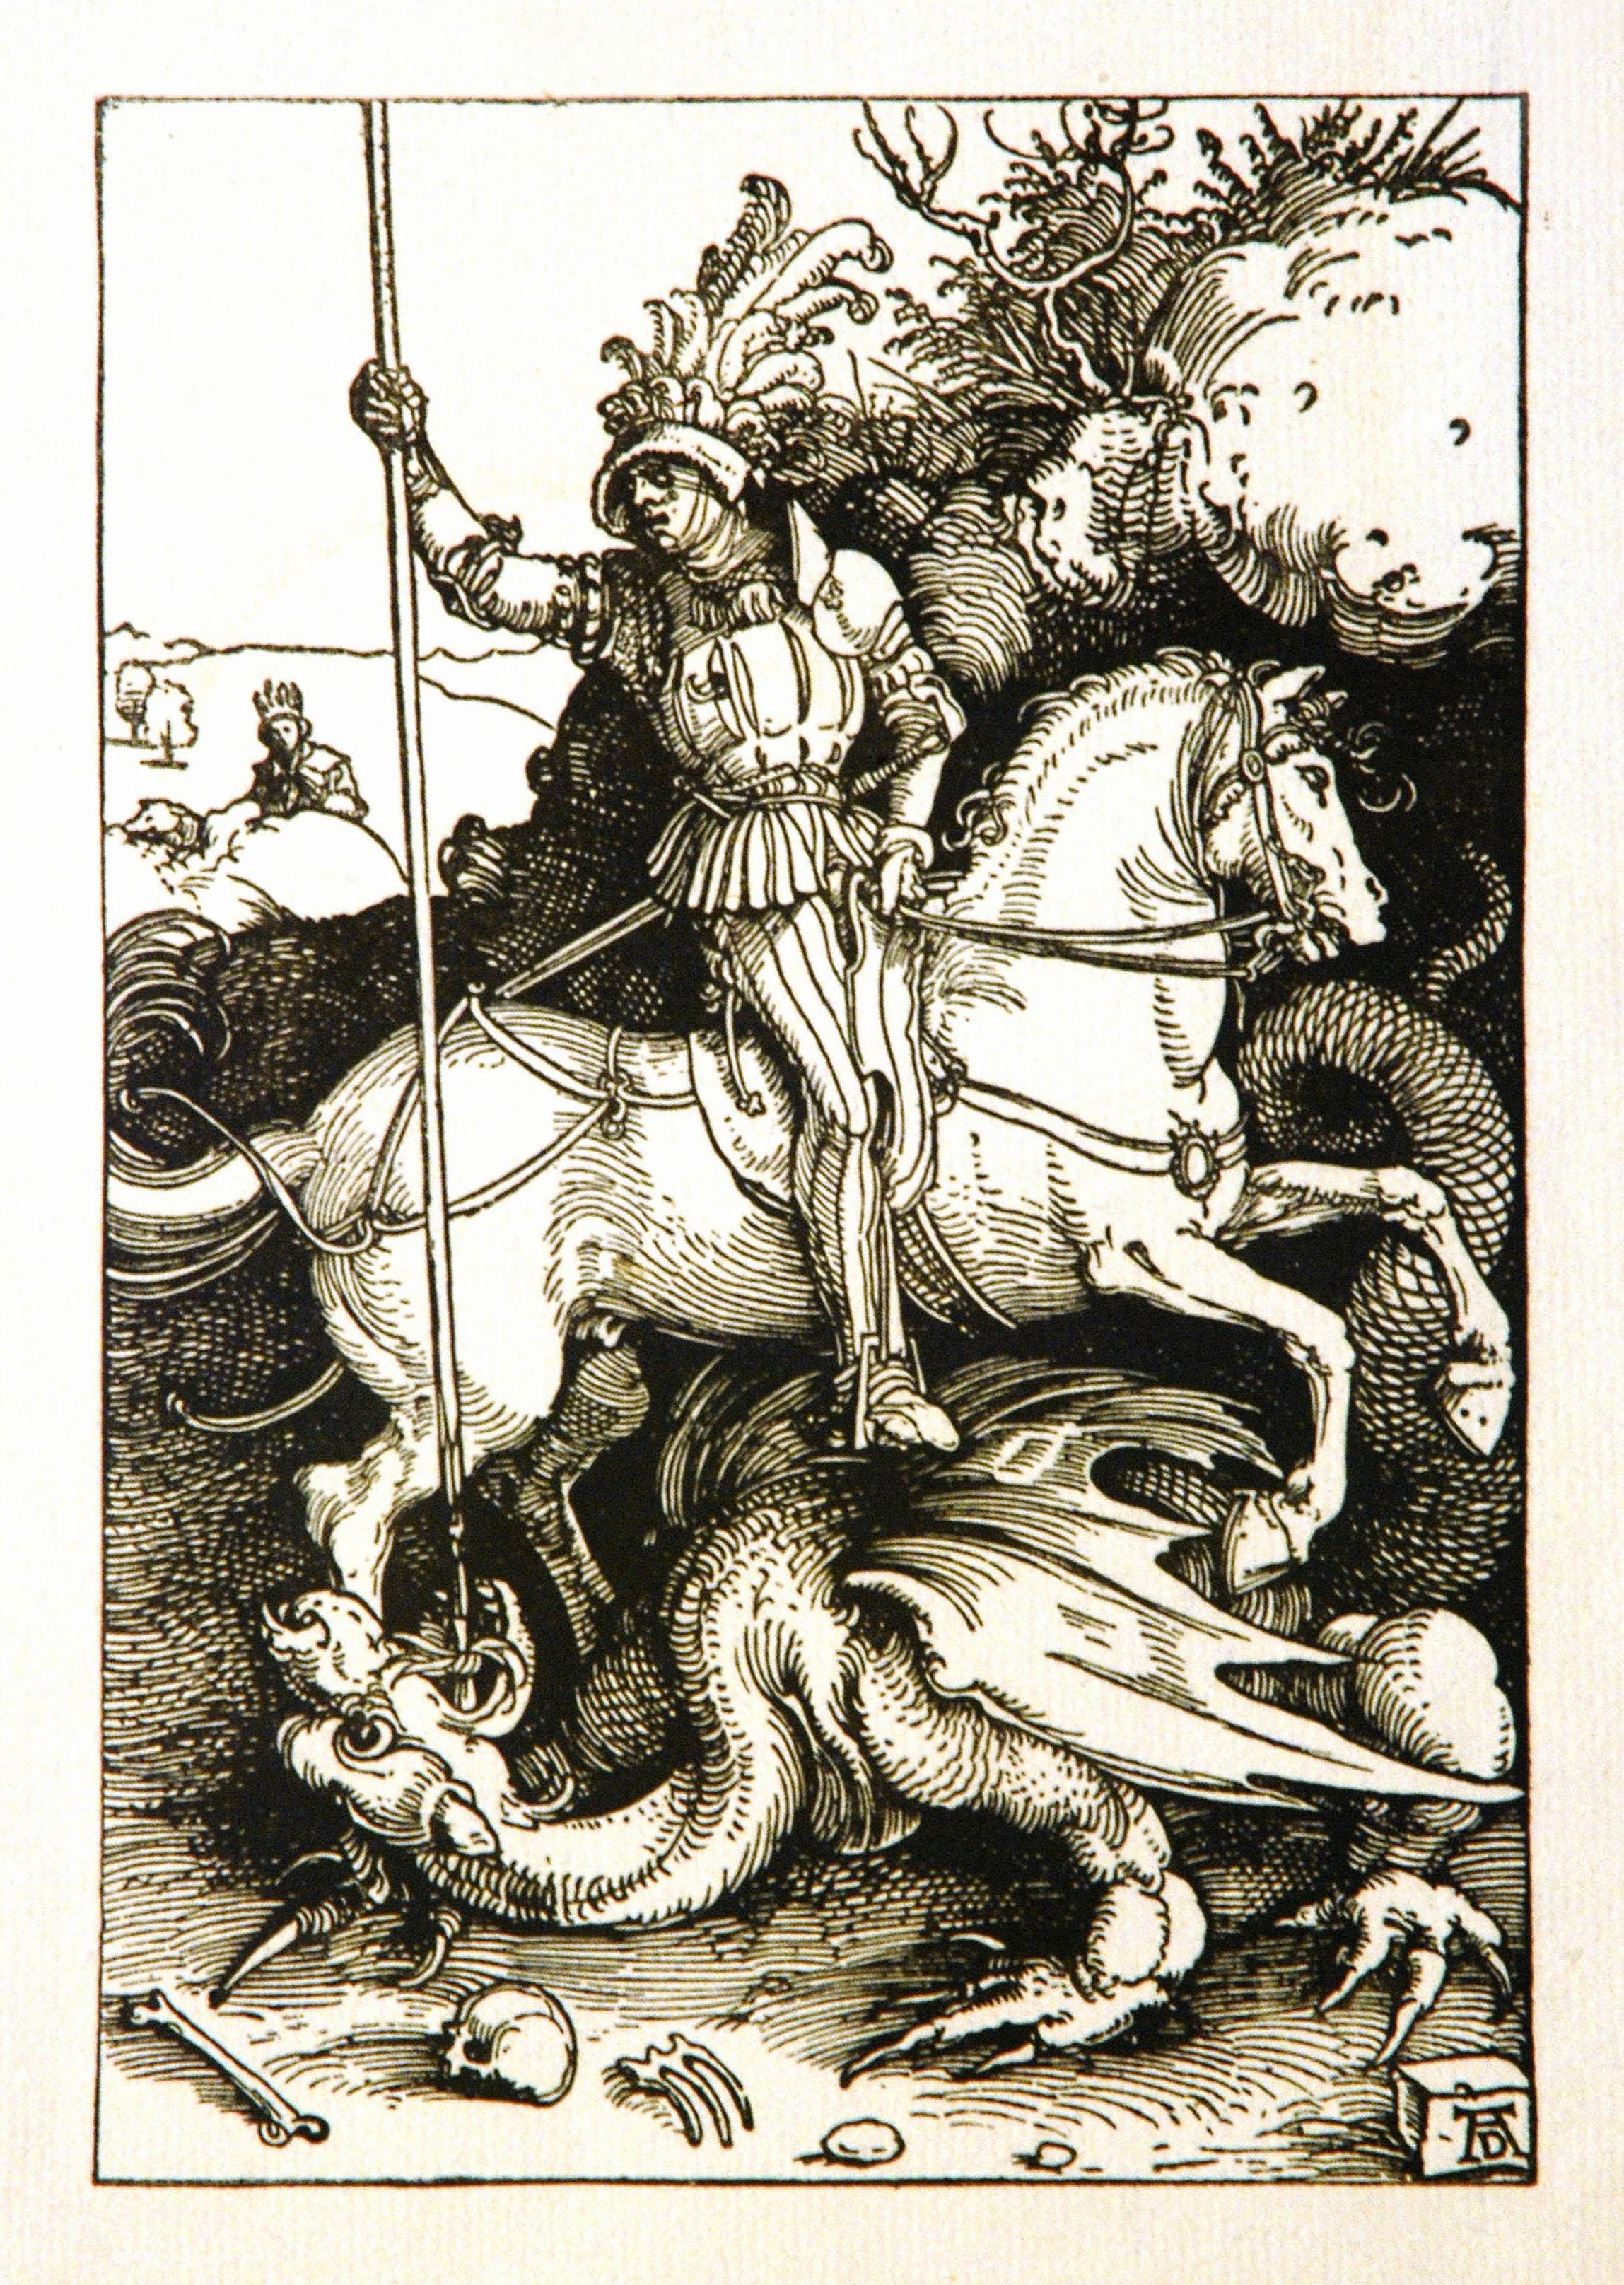 Depiction of Jorge de Capadocia